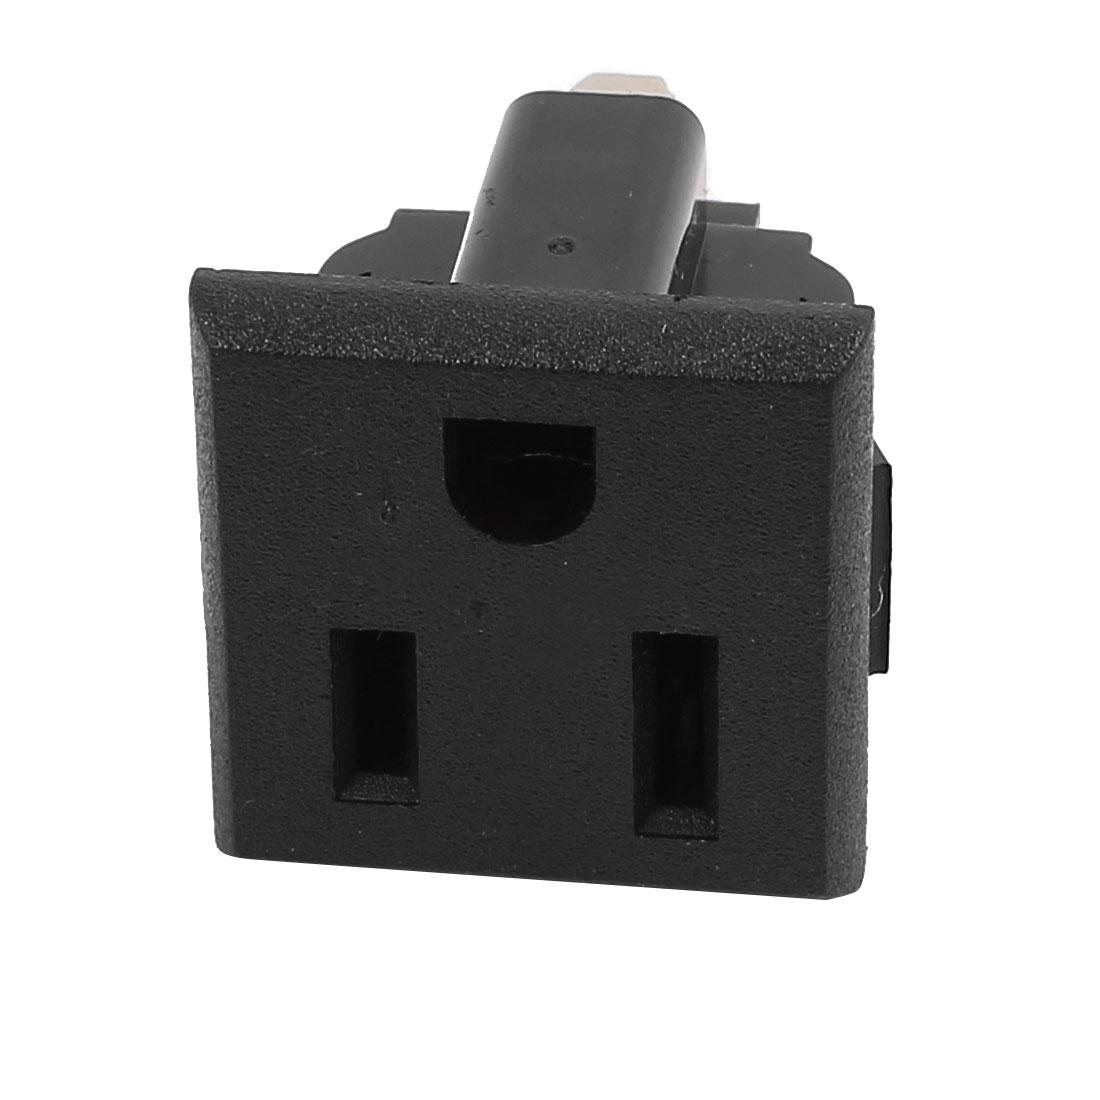 AC 125V 15A US Plug 3 Terminal Outlet Power Socket Connector Black Panel Mount